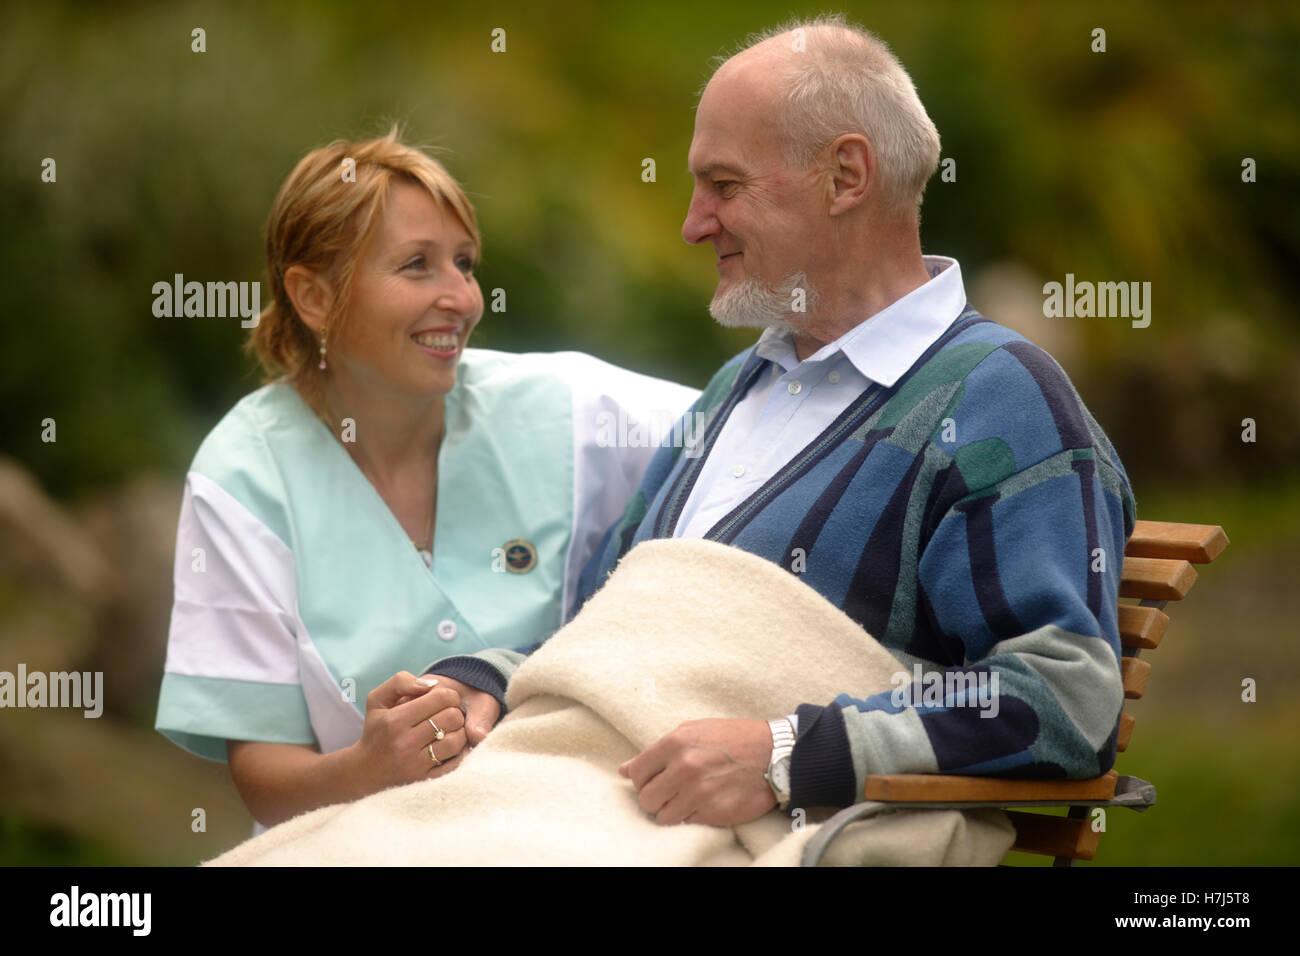 Old man with nurse - Stock Image